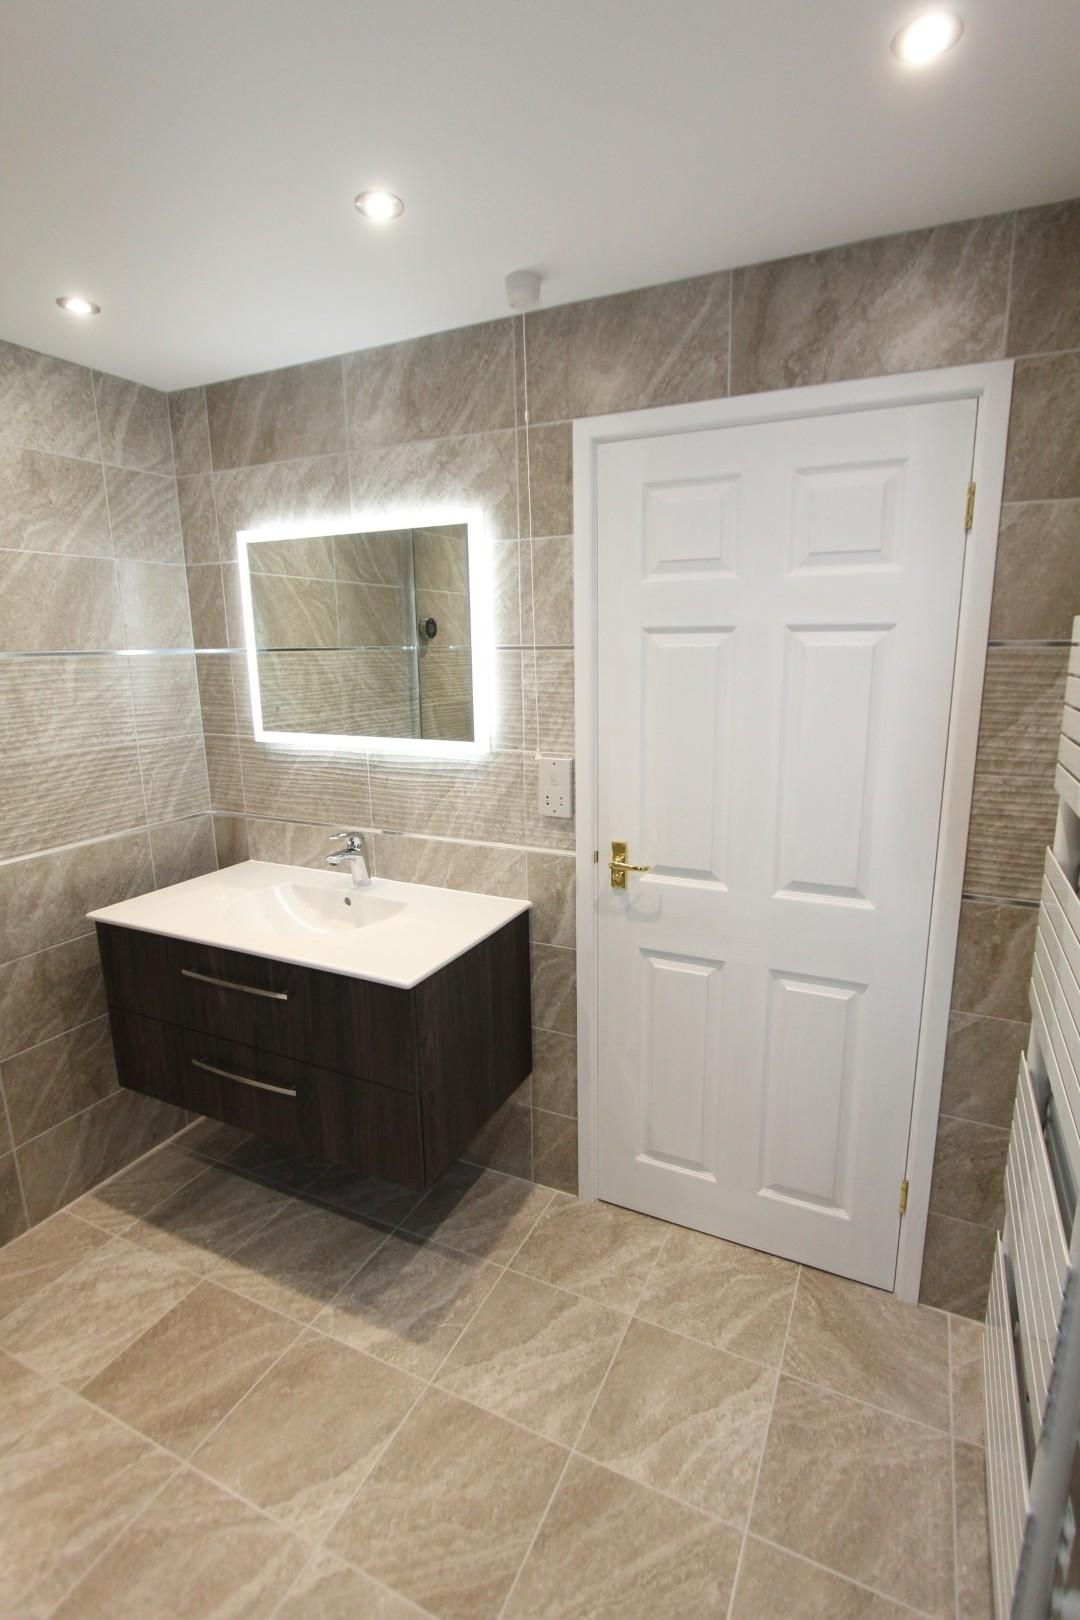 Dack Atlantic Bathrooms & Kitchens (15).jpeg